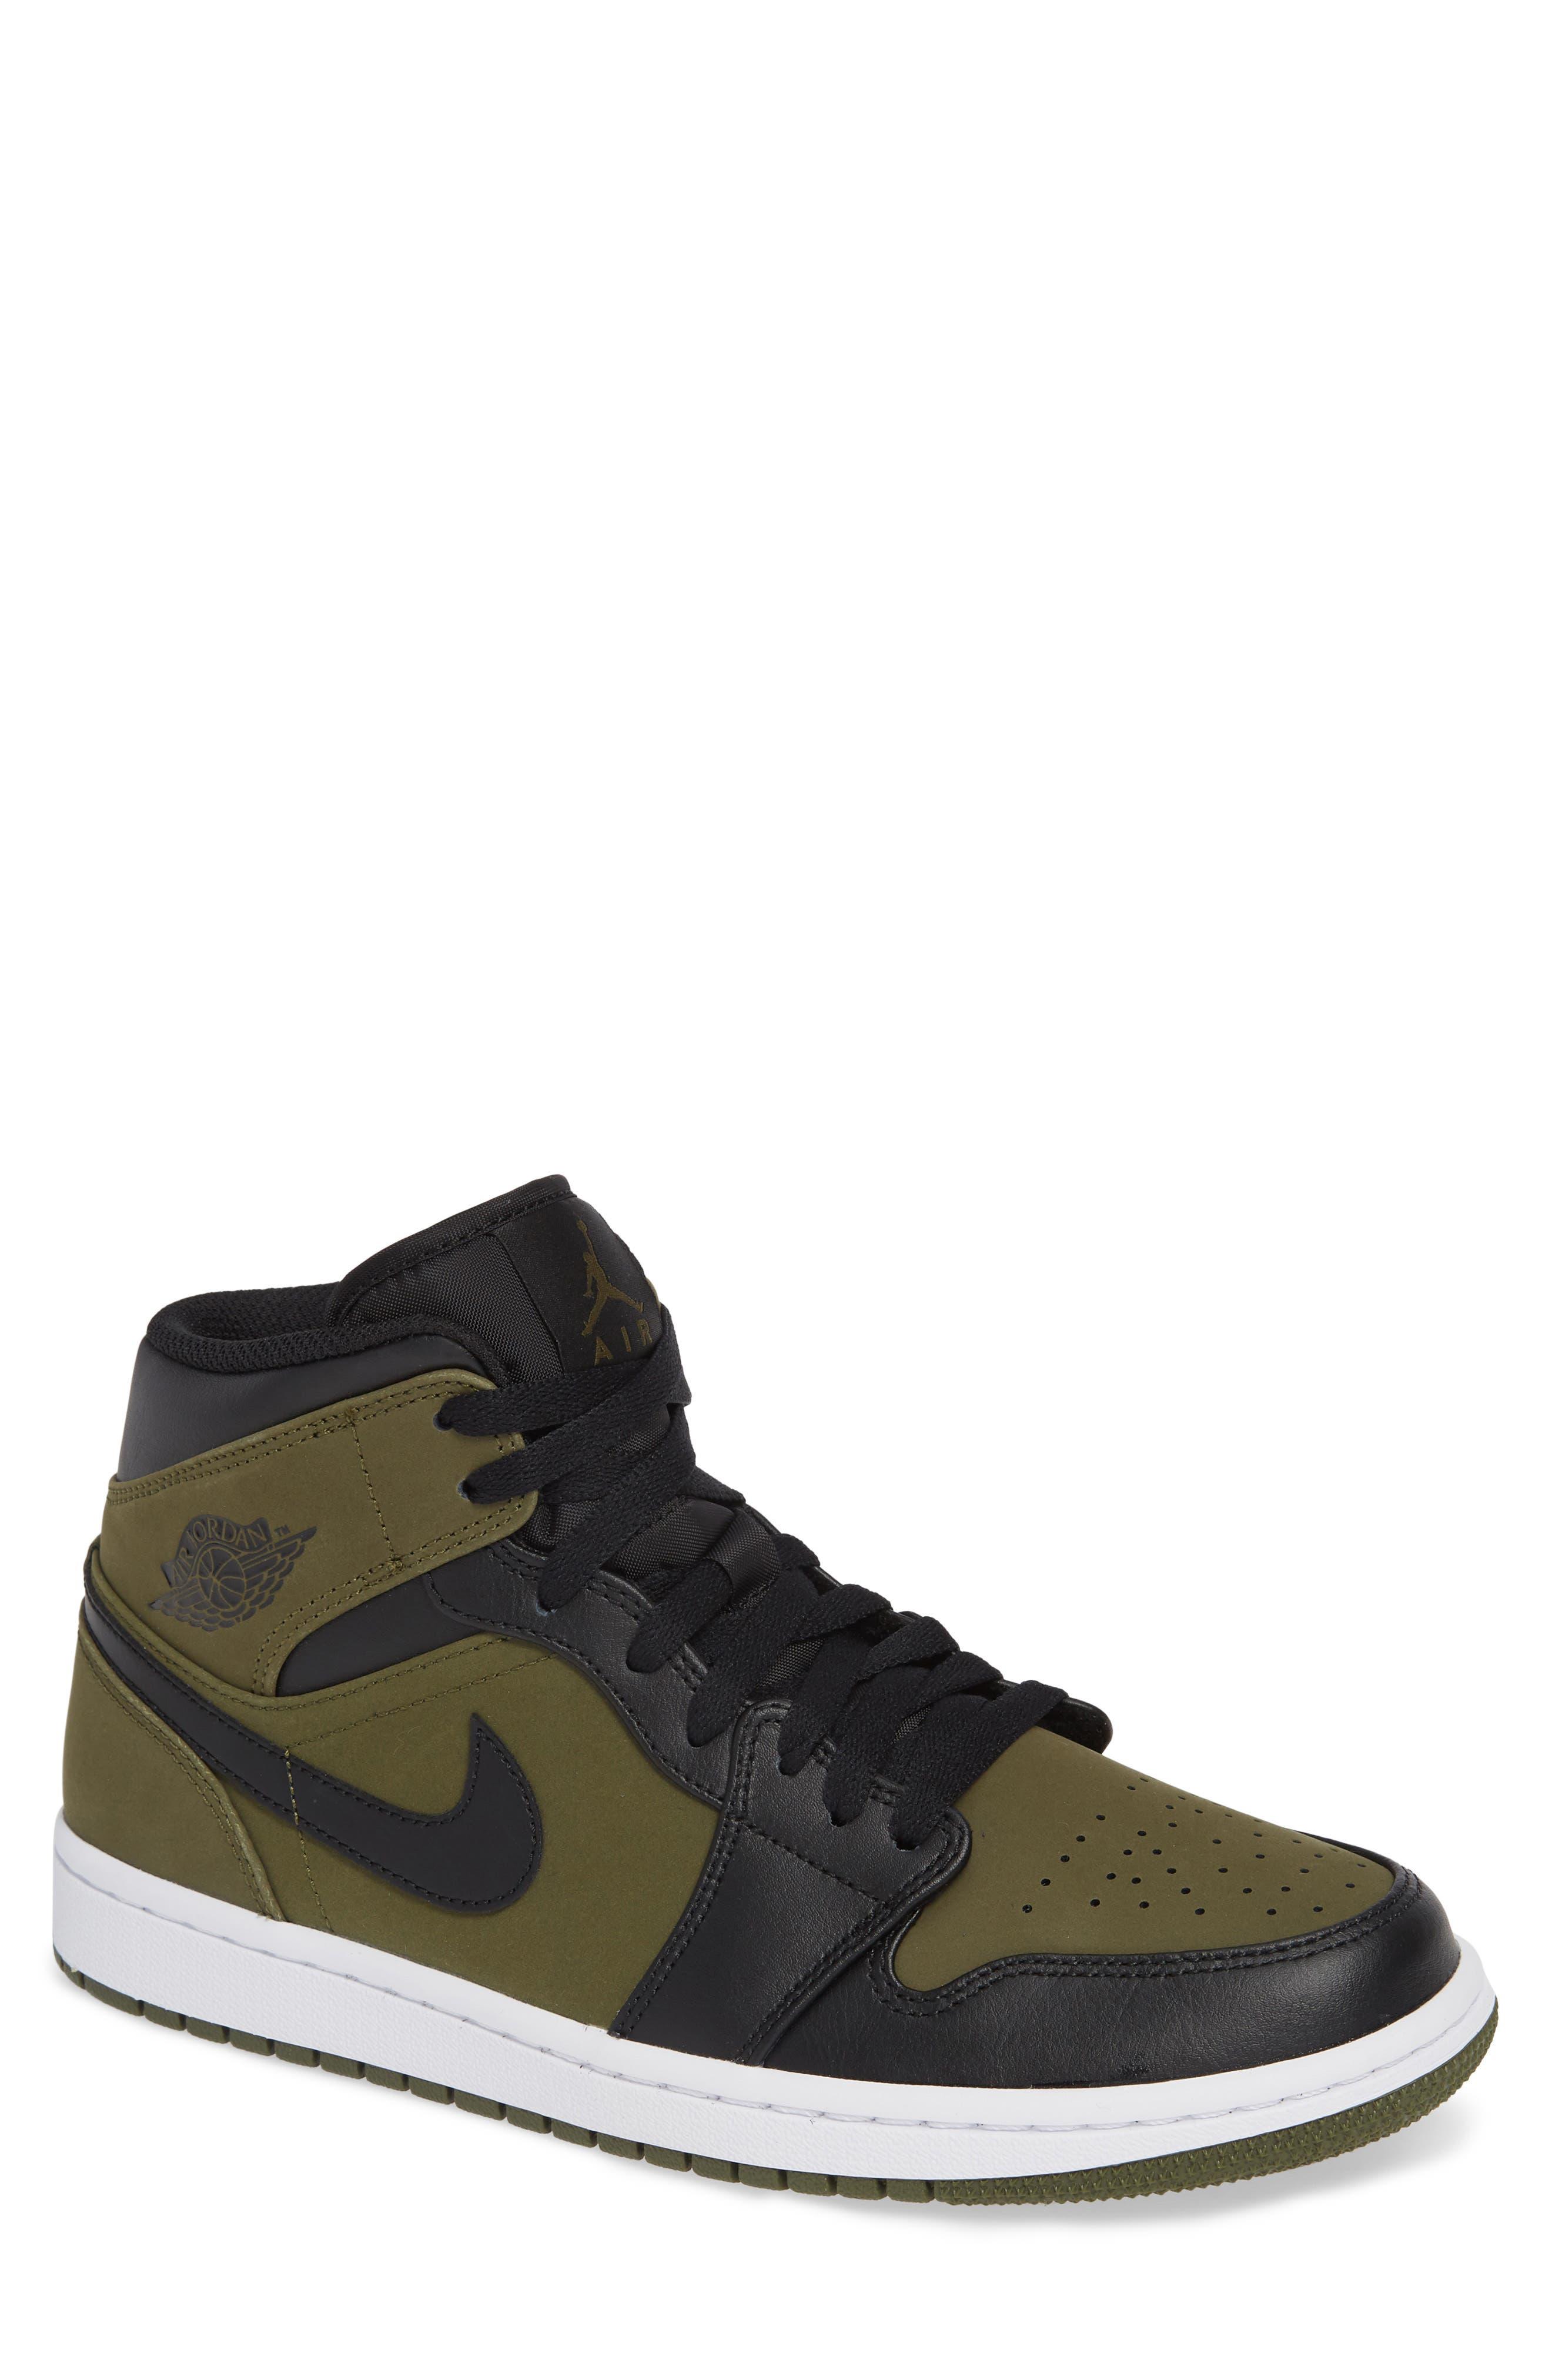 'Air Jordan 1 Mid' Sneaker,                             Main thumbnail 1, color,                             OLIVE CANVAS/ BLACK/ WHITE